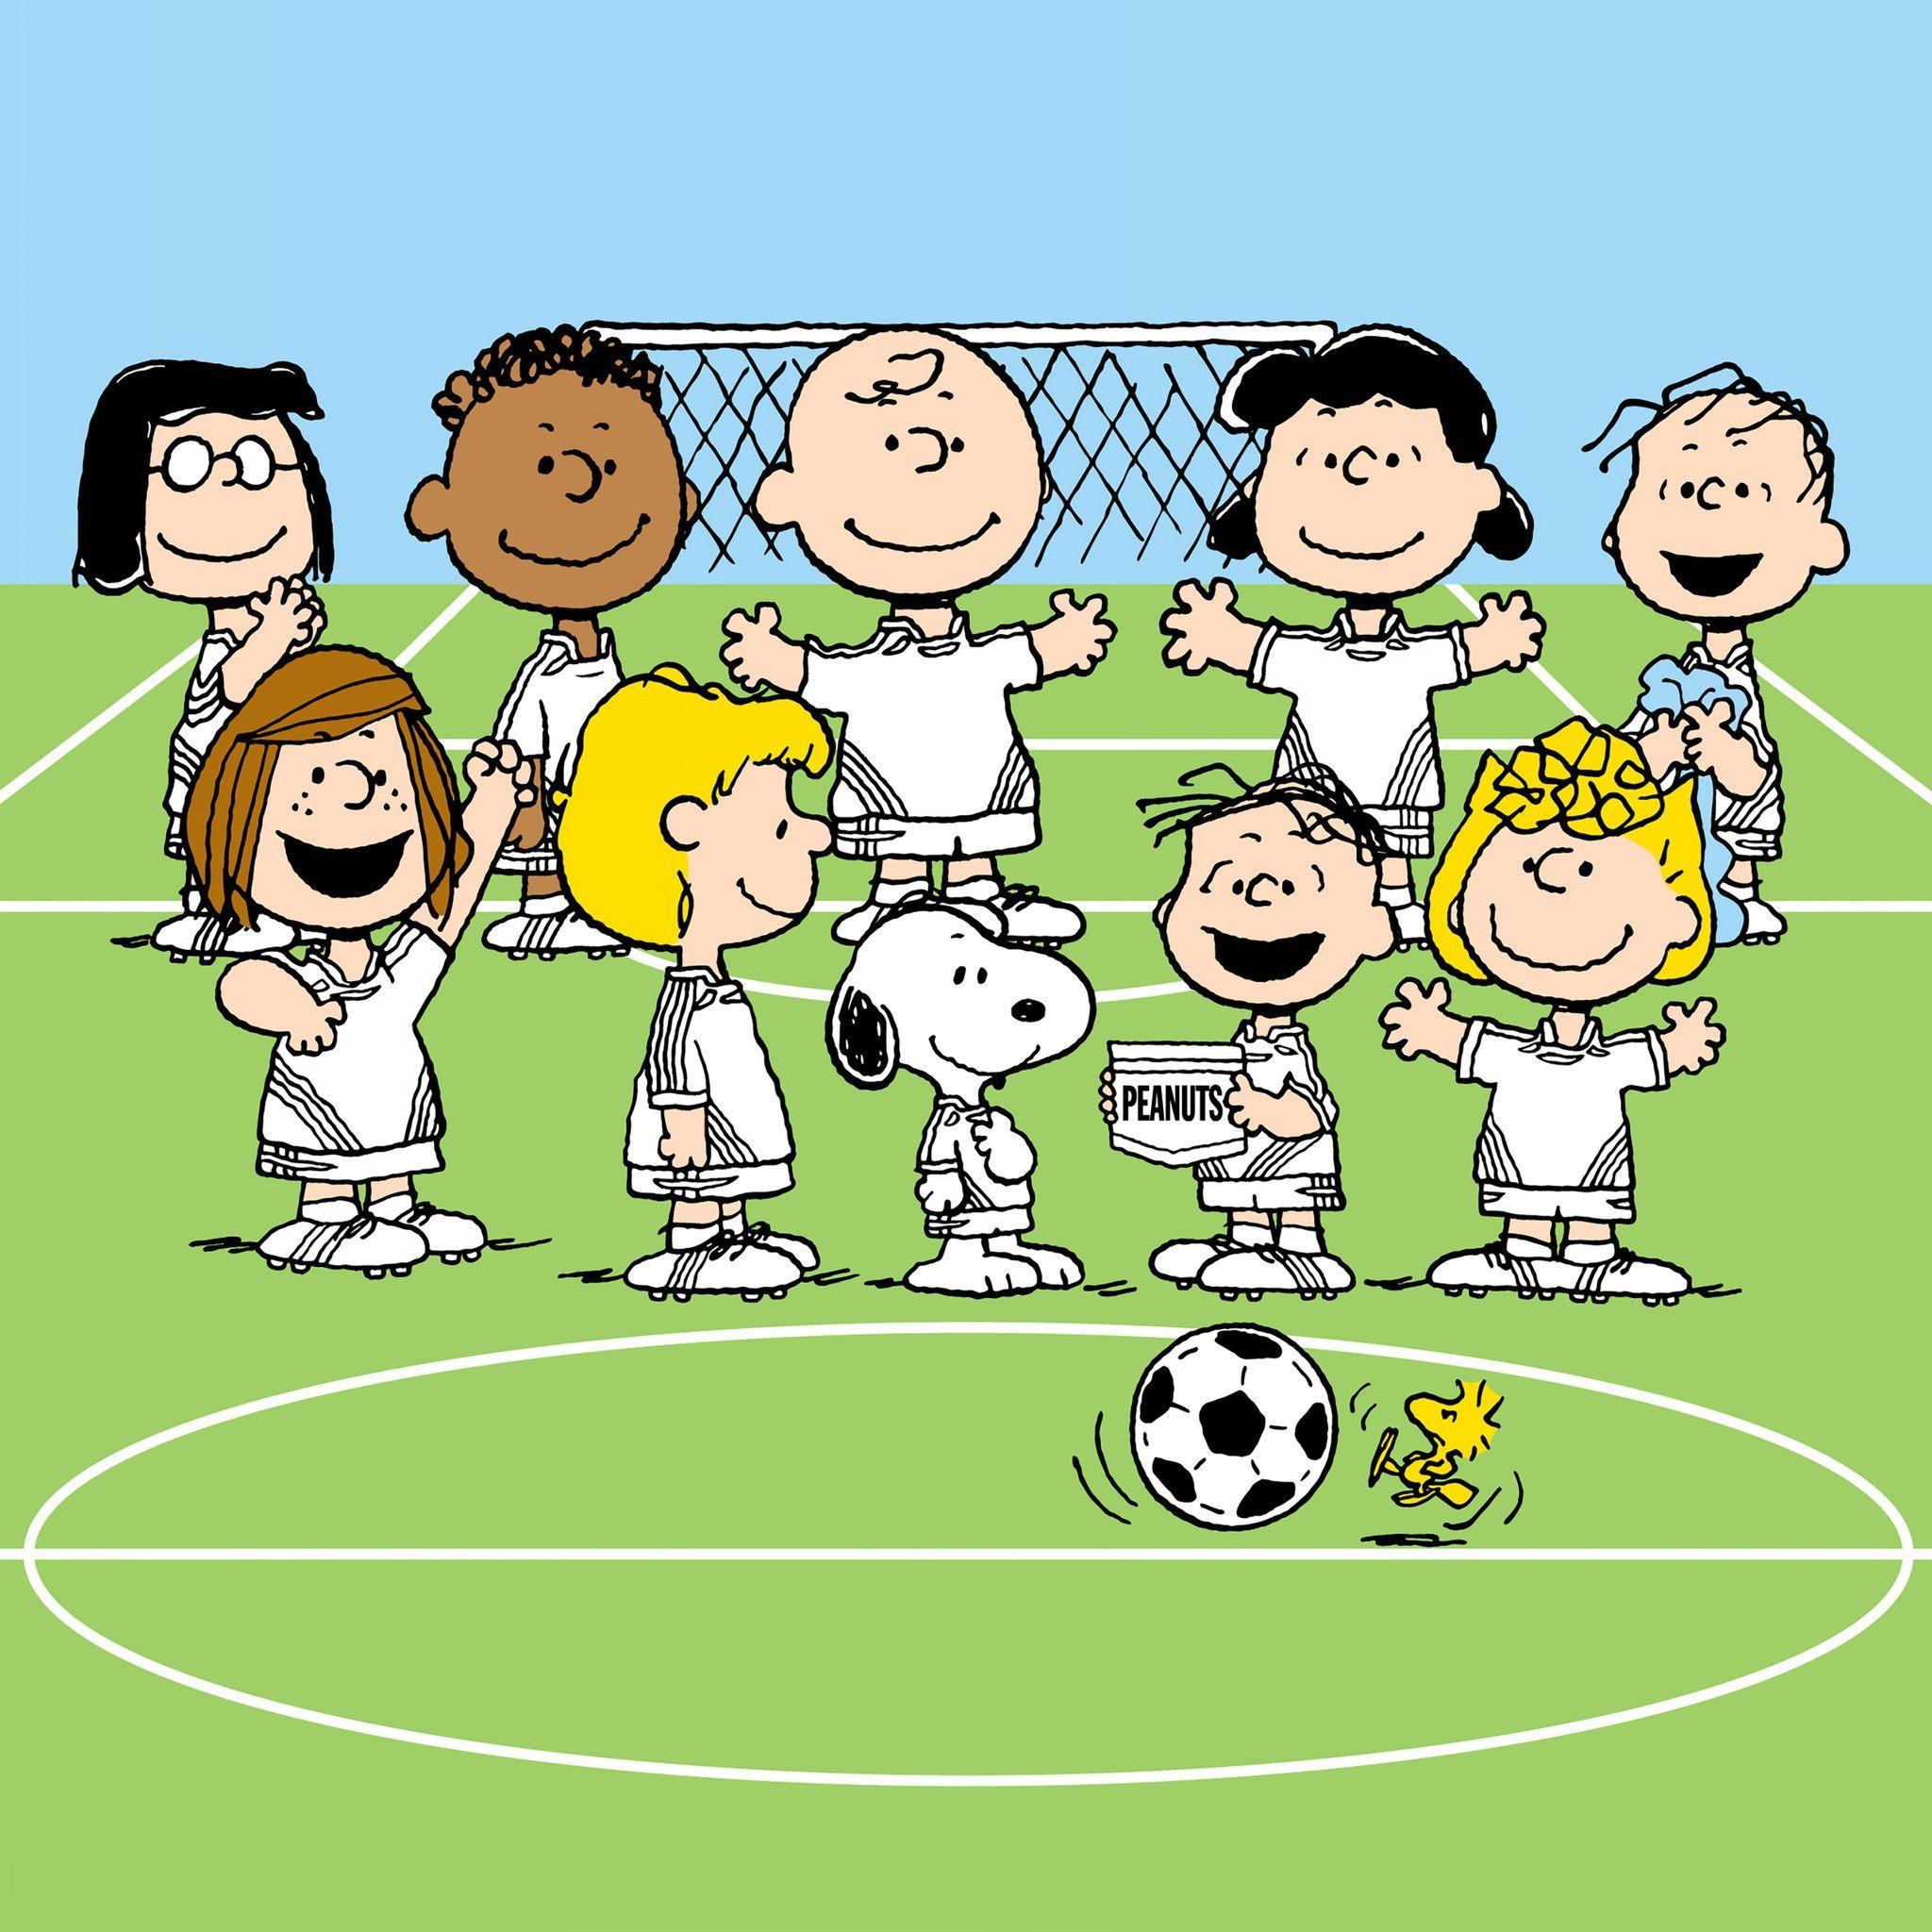 Peanuts Soccer Team Snoopy Cartoon Charlie Brown Charlie Brown Peanuts